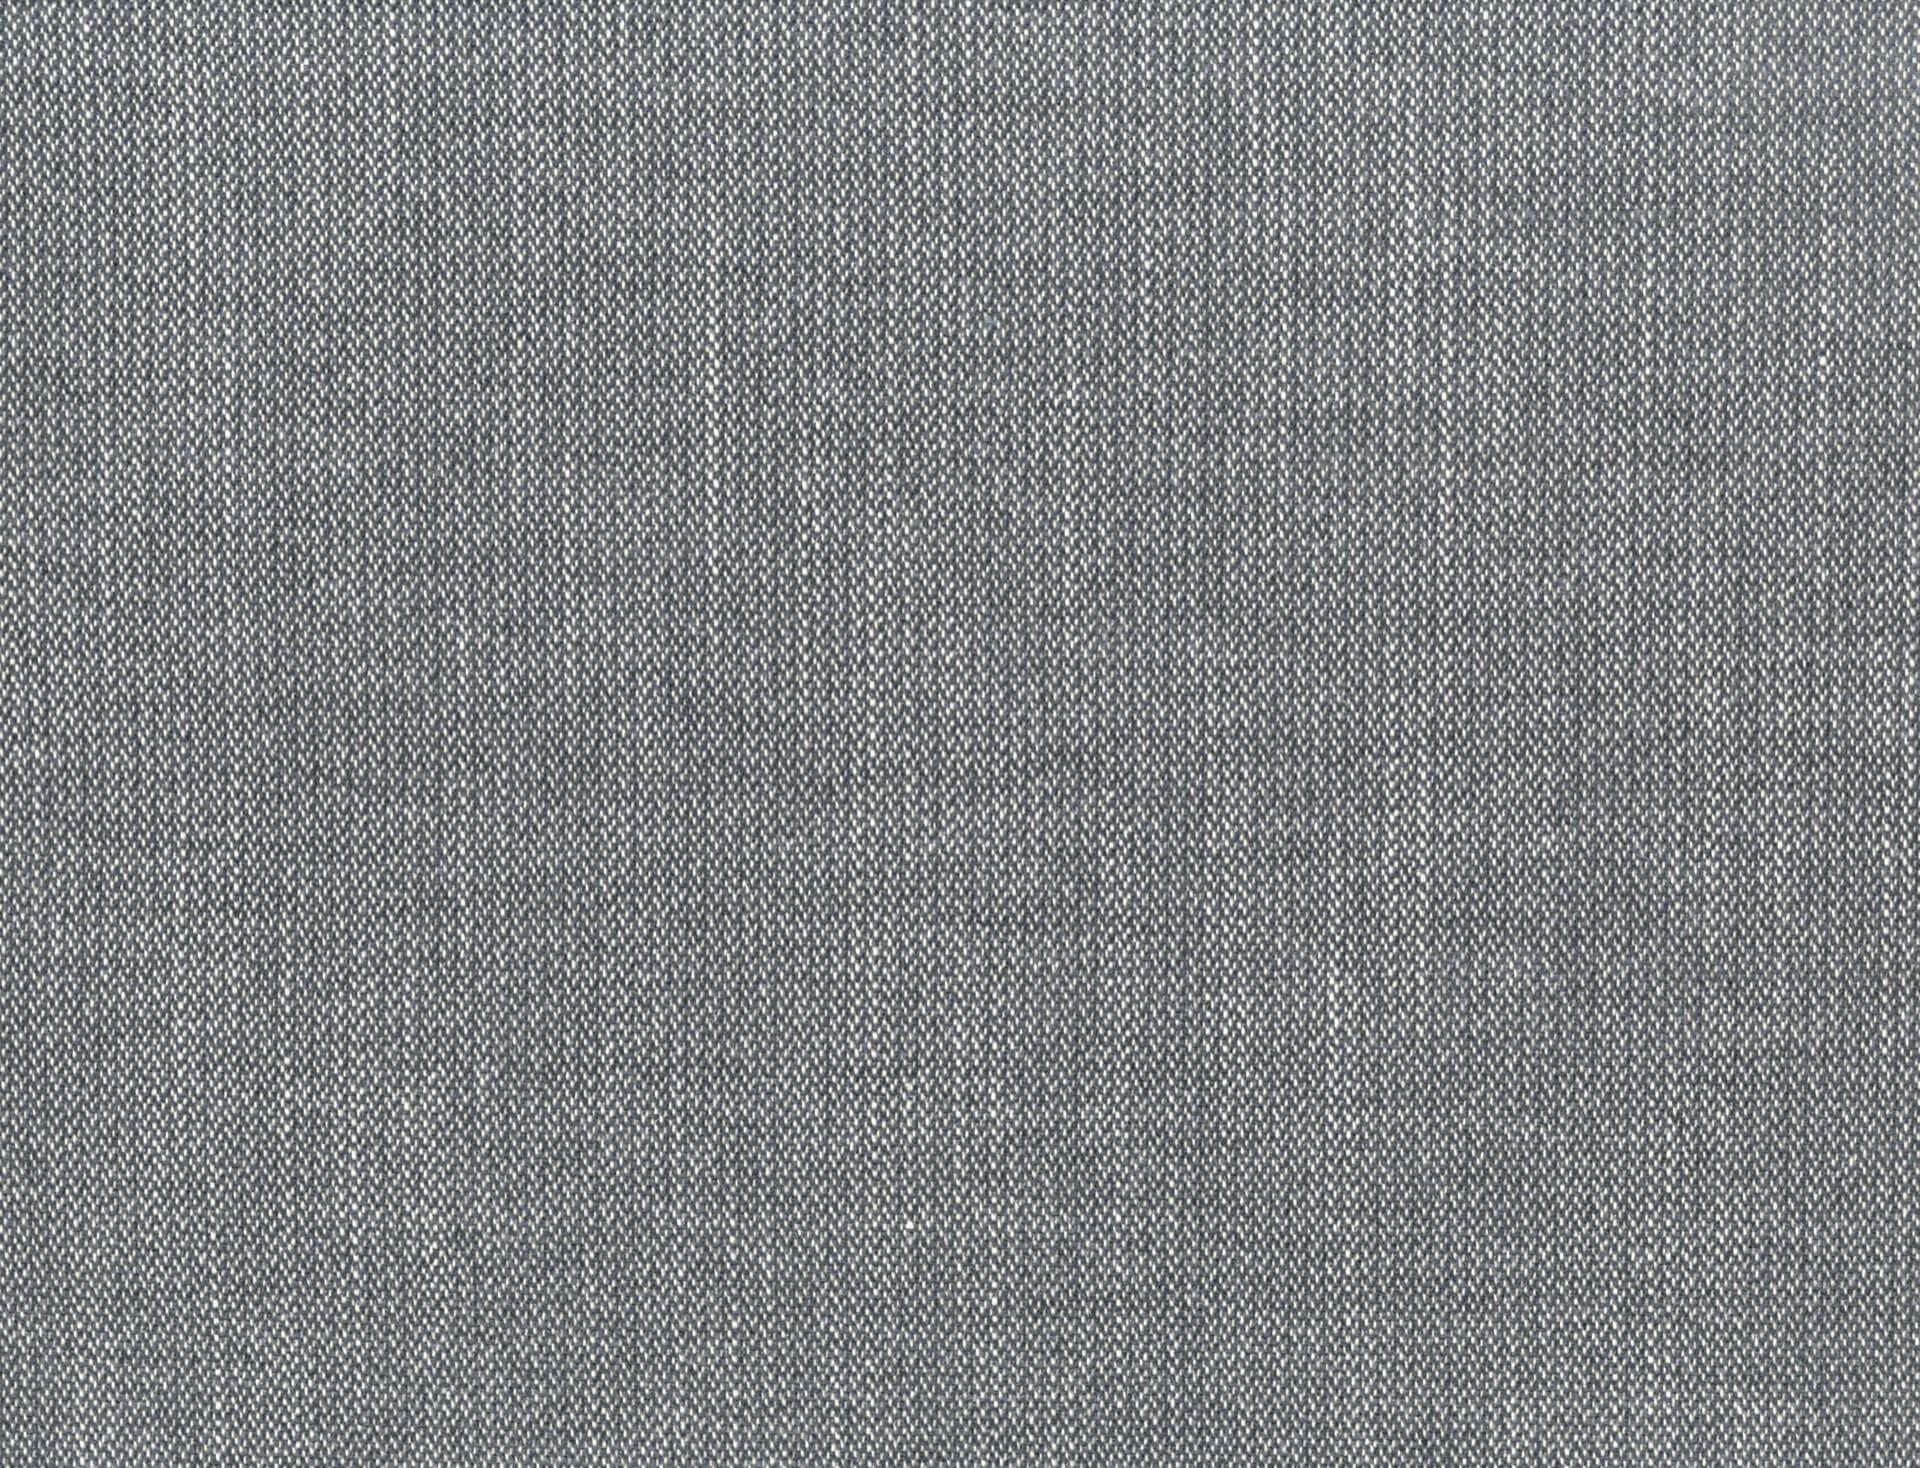 Nori Fabric Grey Beige